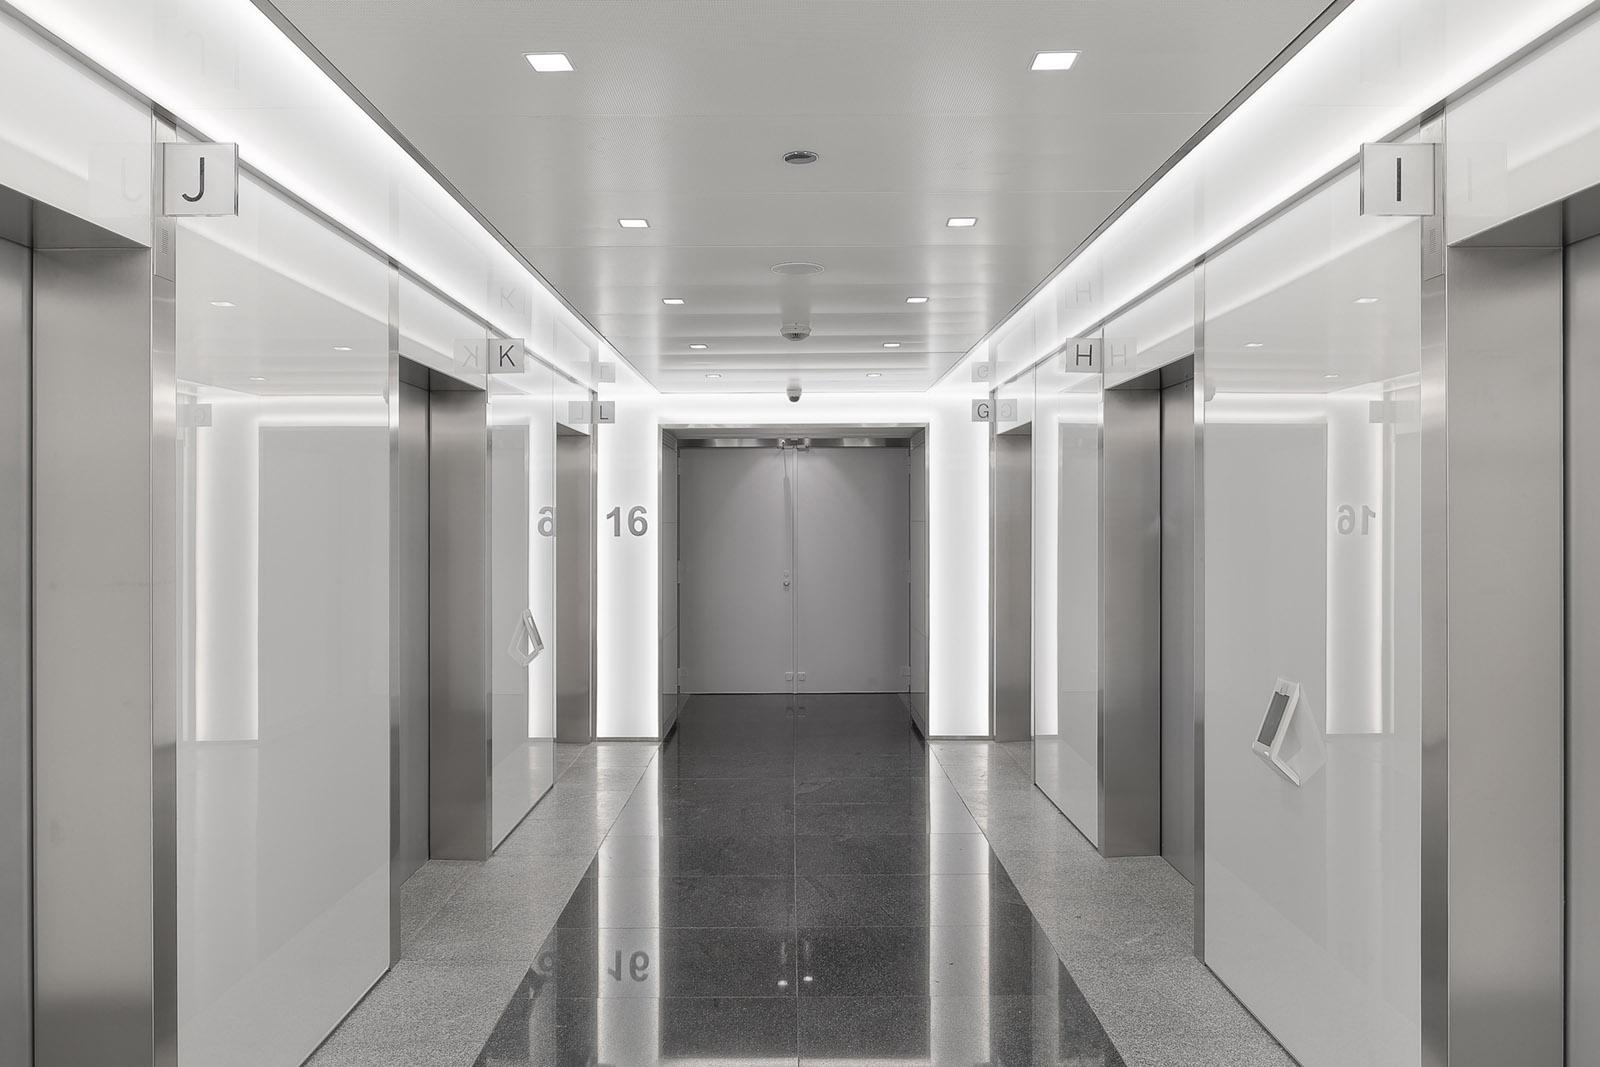 Architectural672-Interior-photographer-Madrid-Spain-.jpg